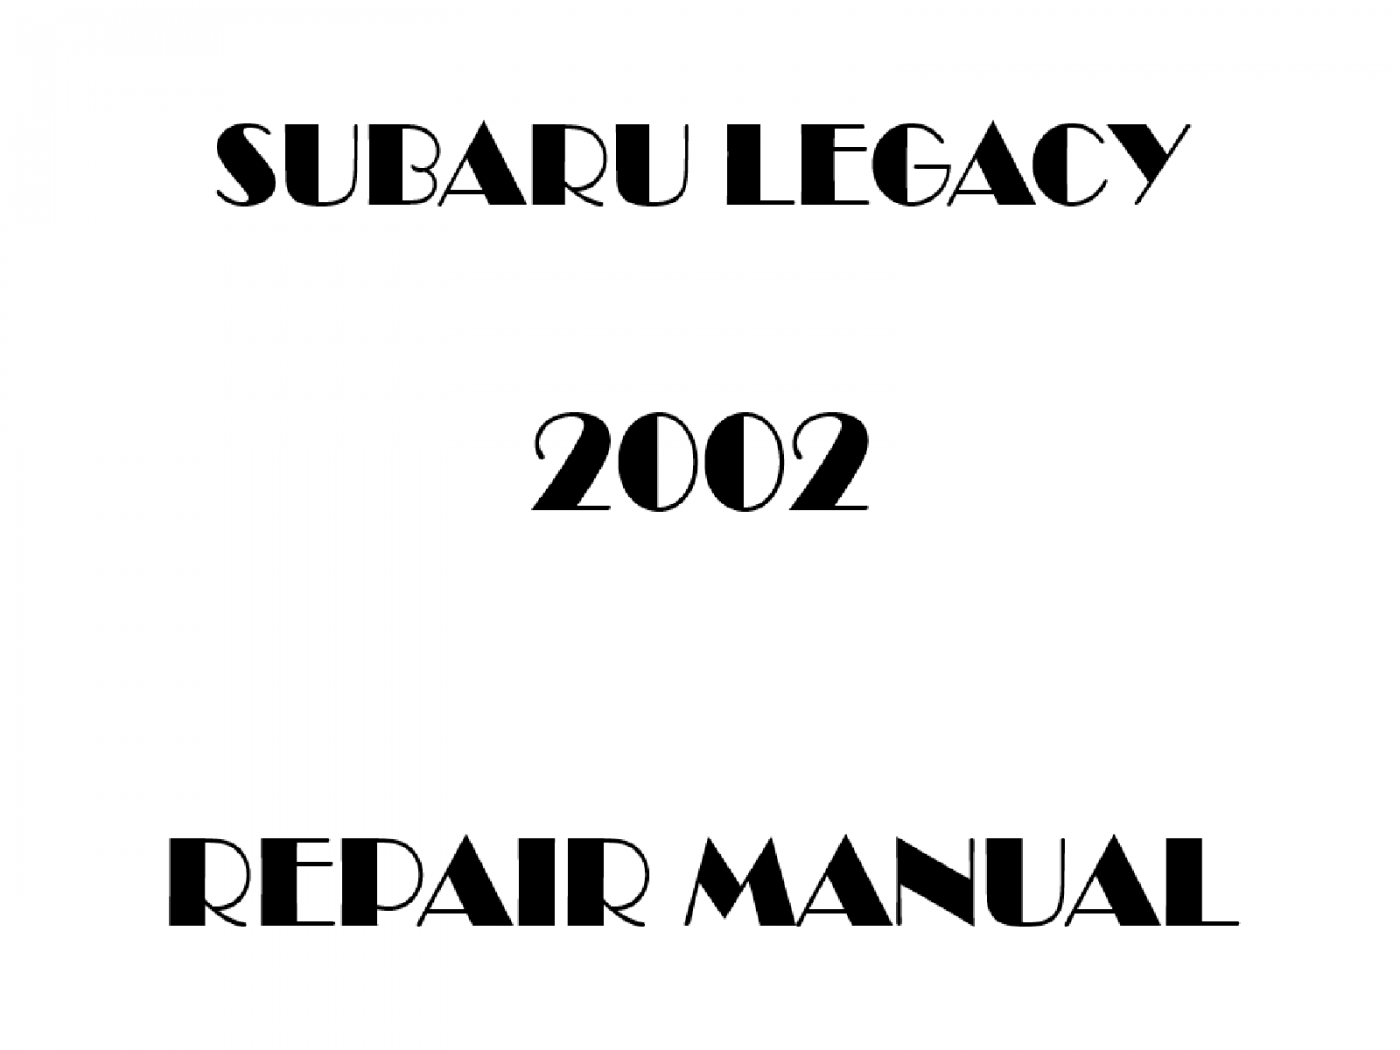 2002 Subaru Legacy repair manual